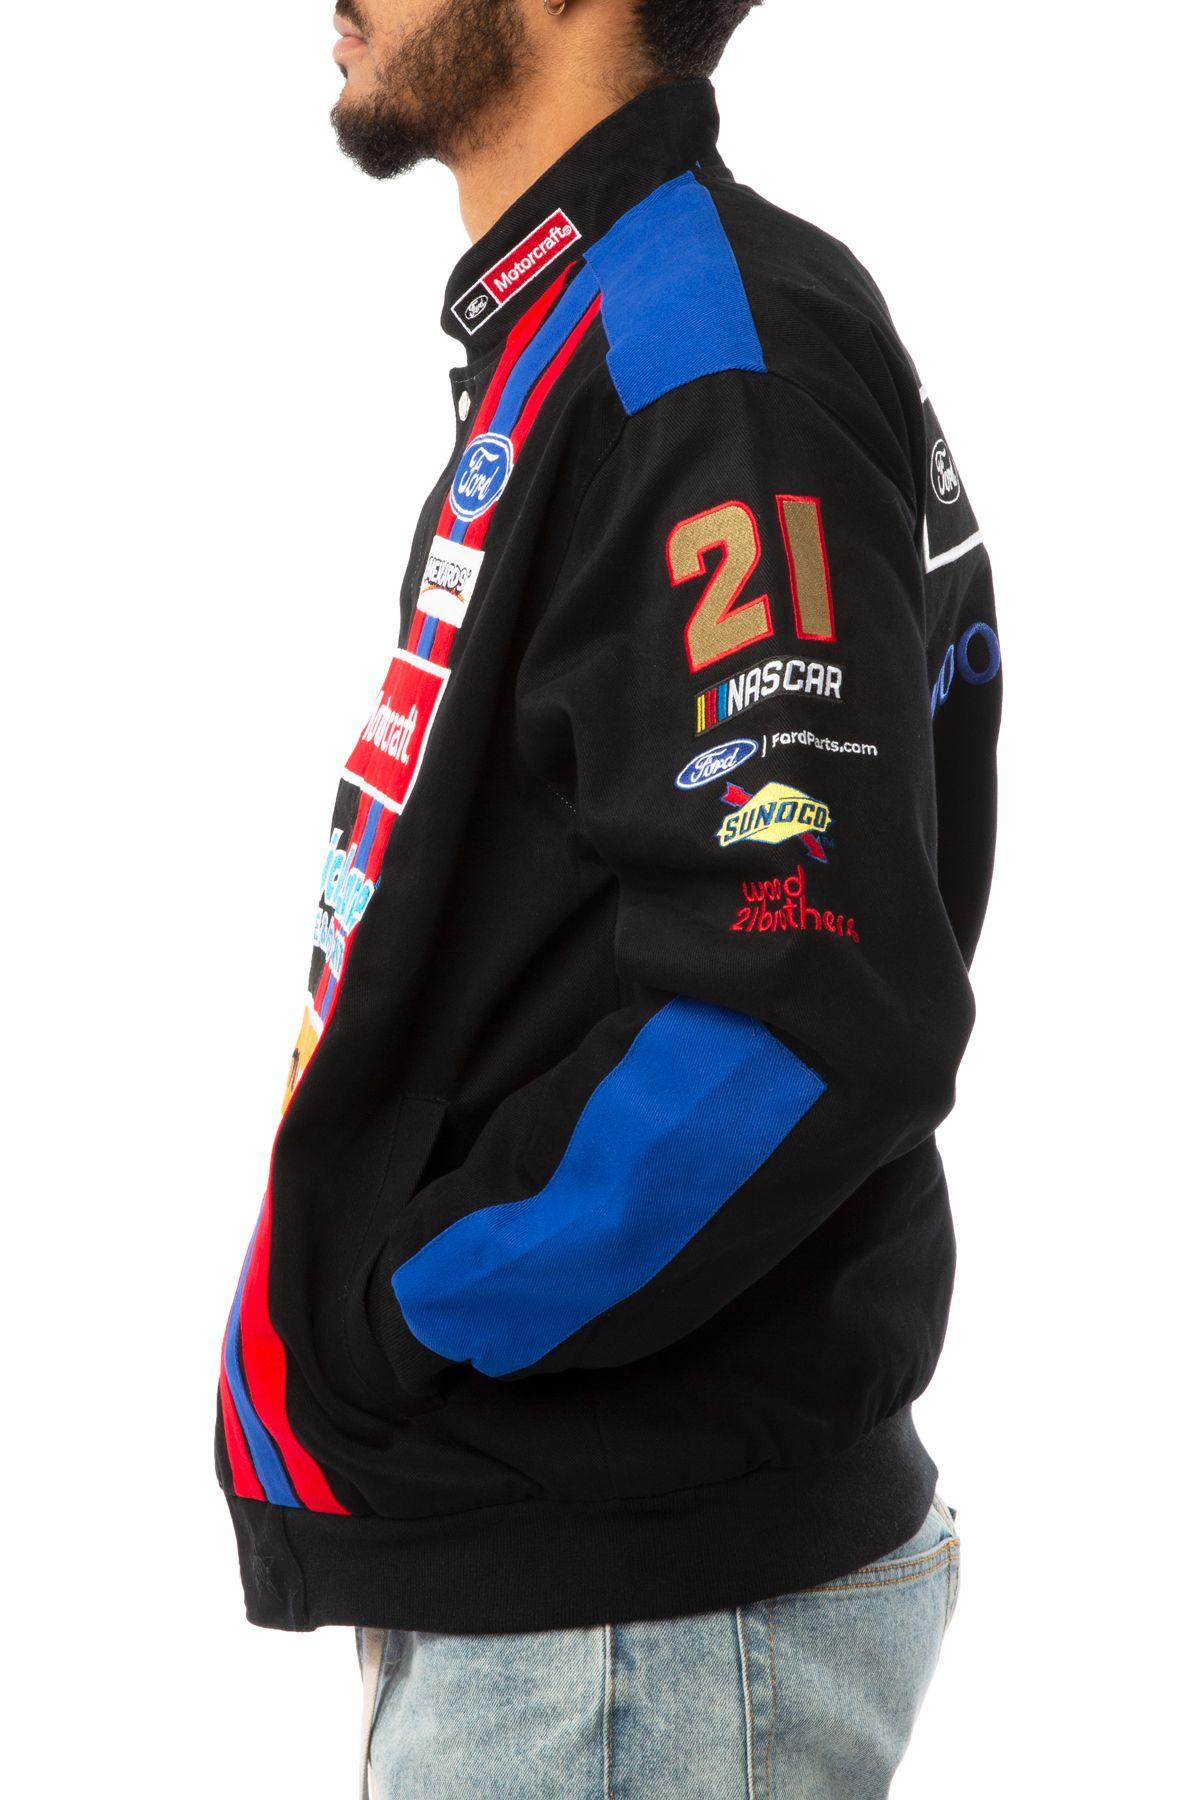 Ford Motorcraft Nascar Racing Jacket